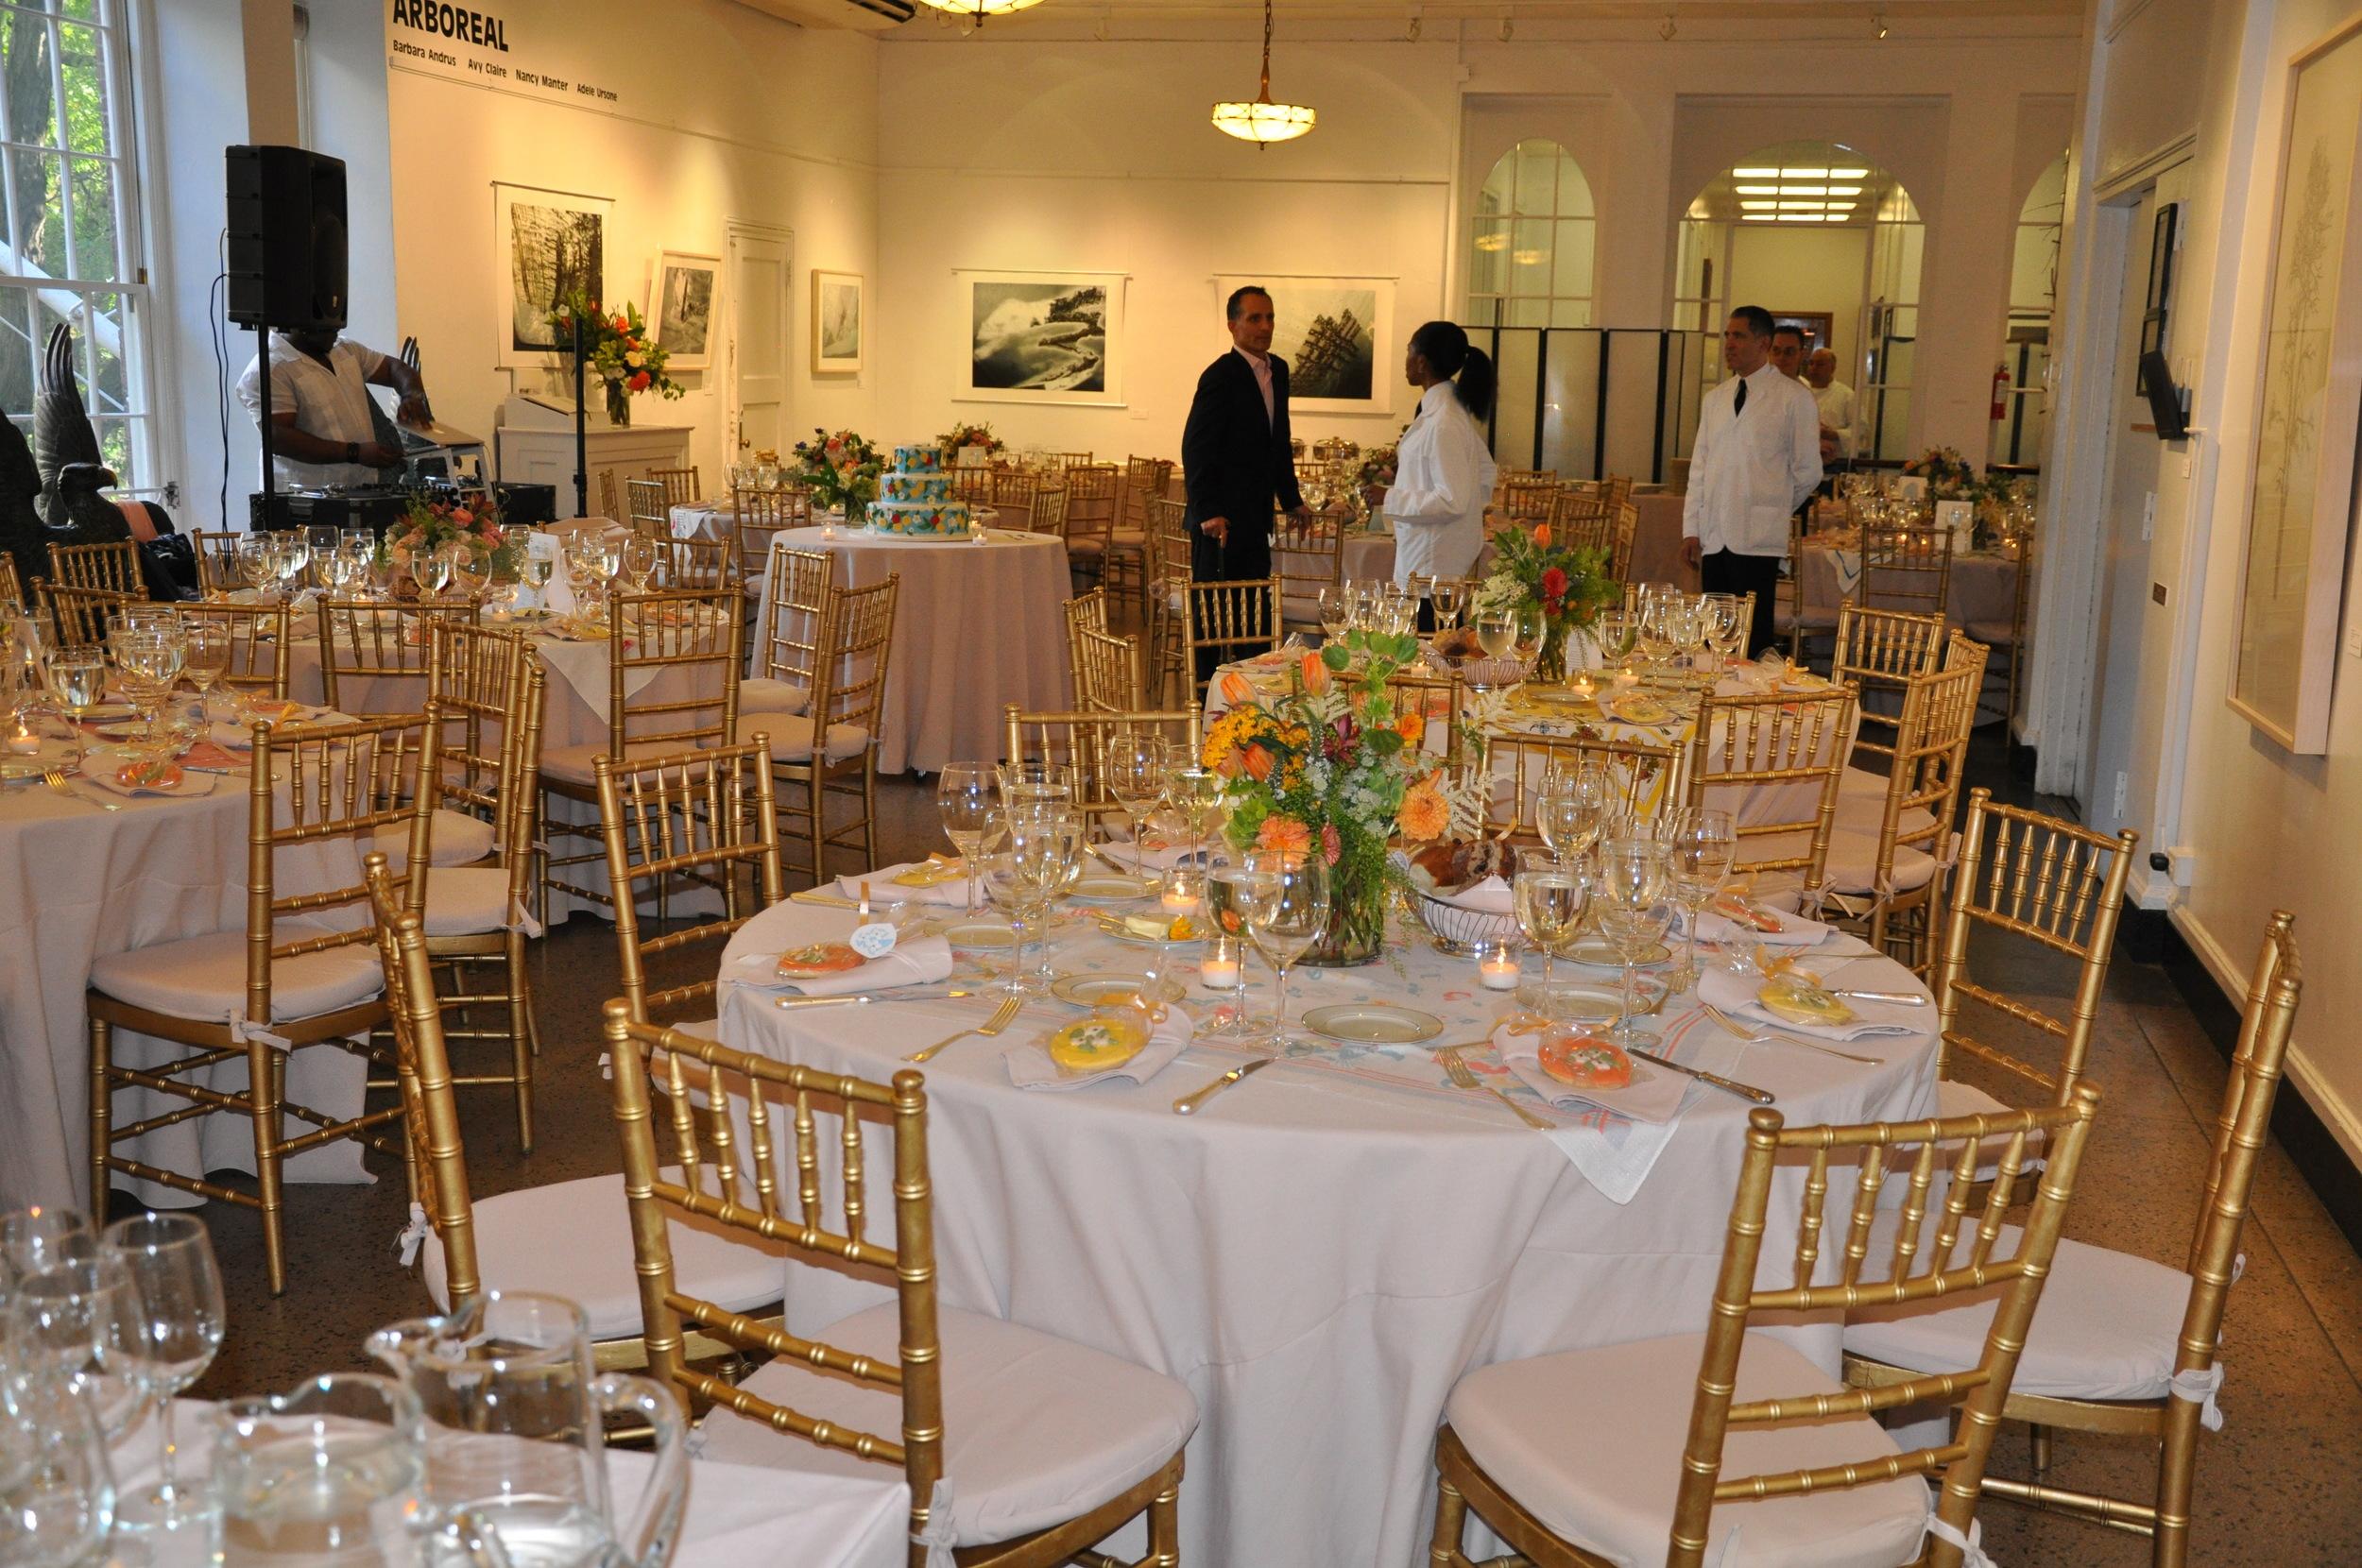 Summer Wedding, Arsenal Gallery in Central Park, NY, NY